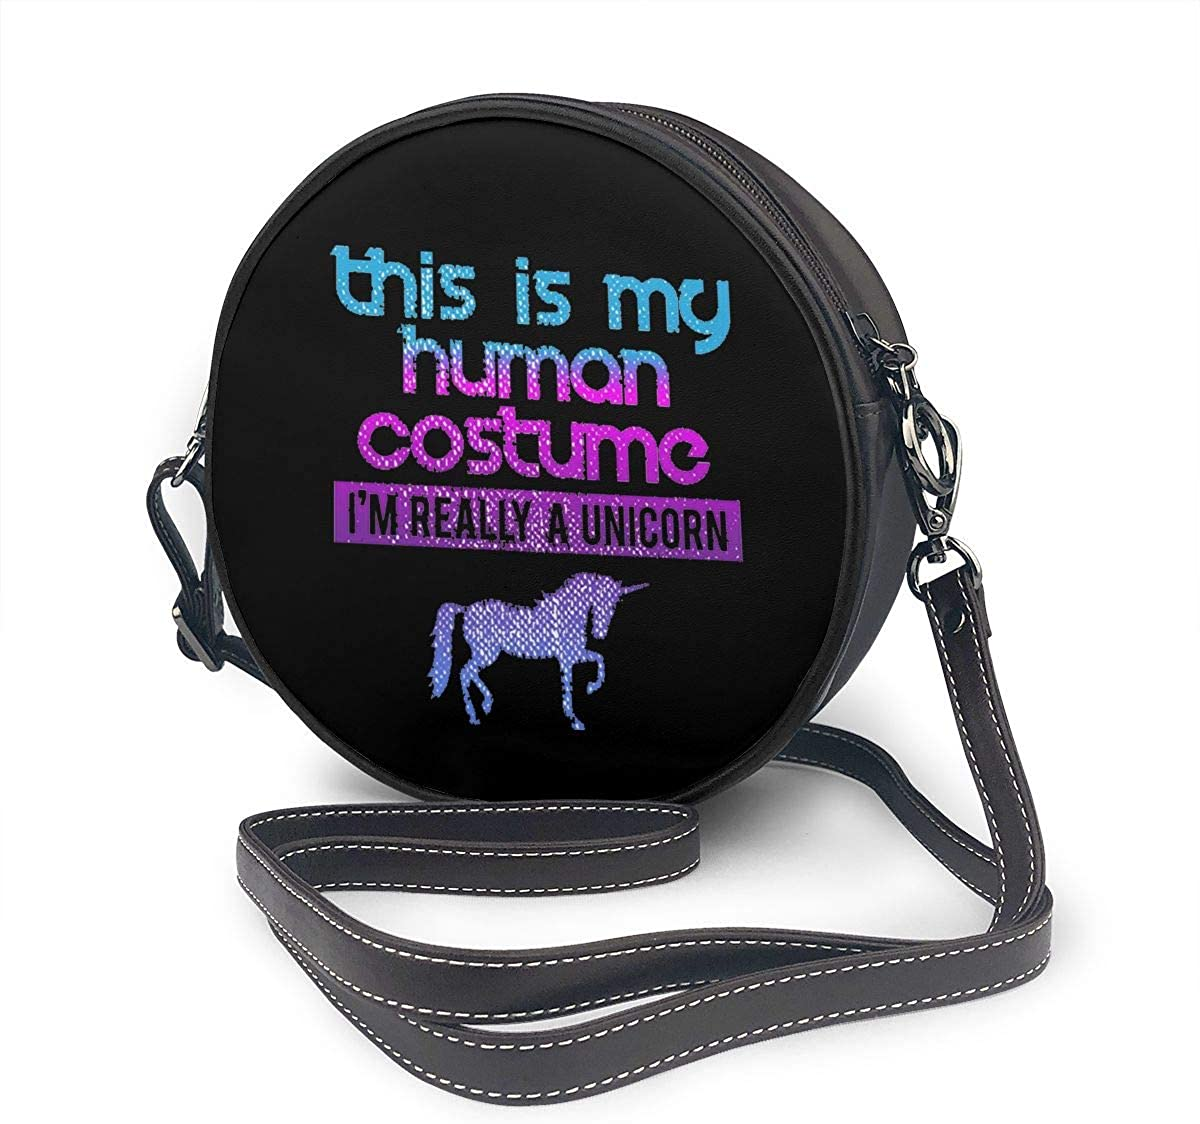 This Is My Human Costume Im Really A Unicorn Halloween Classic Round Shoulder Bag Crossbody Leather Handbag